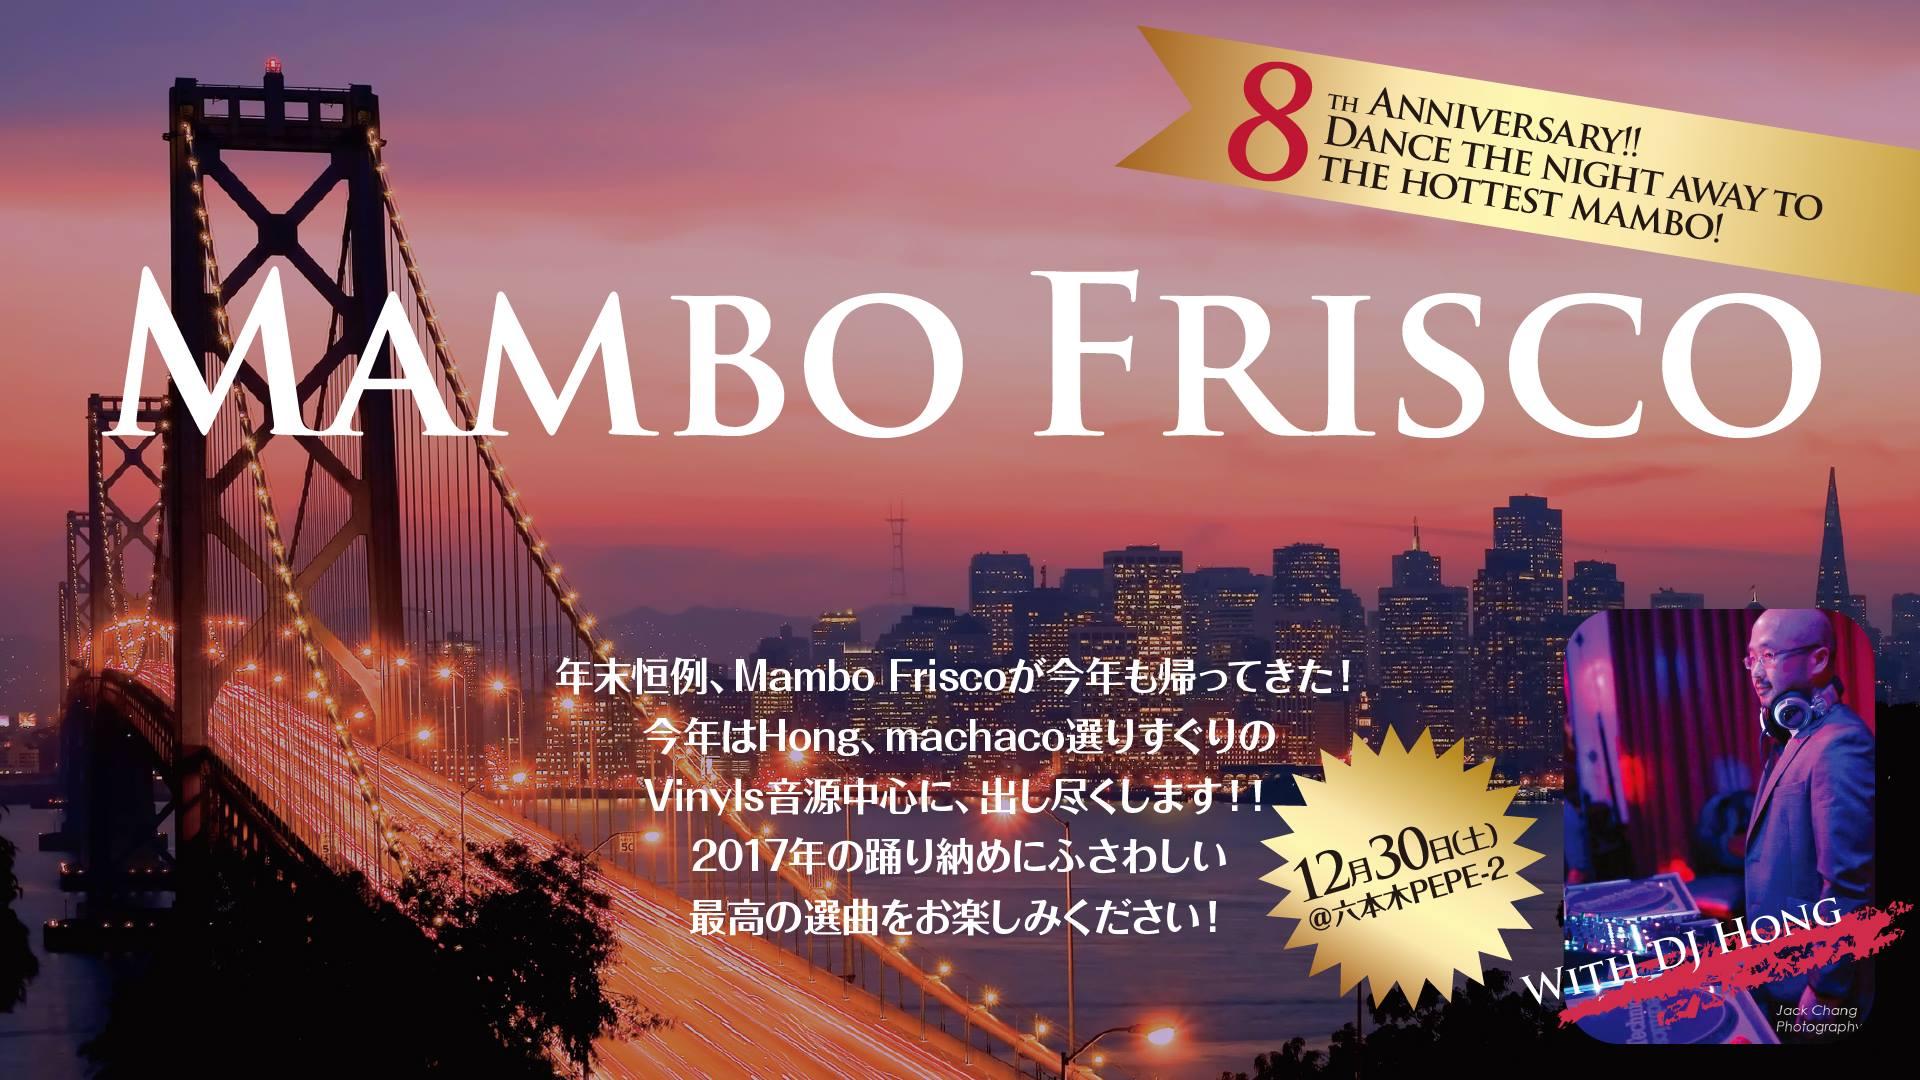 12:30 Mambo Frisco Vol.8 in Tokyo Presented by DJ Hong & machaco